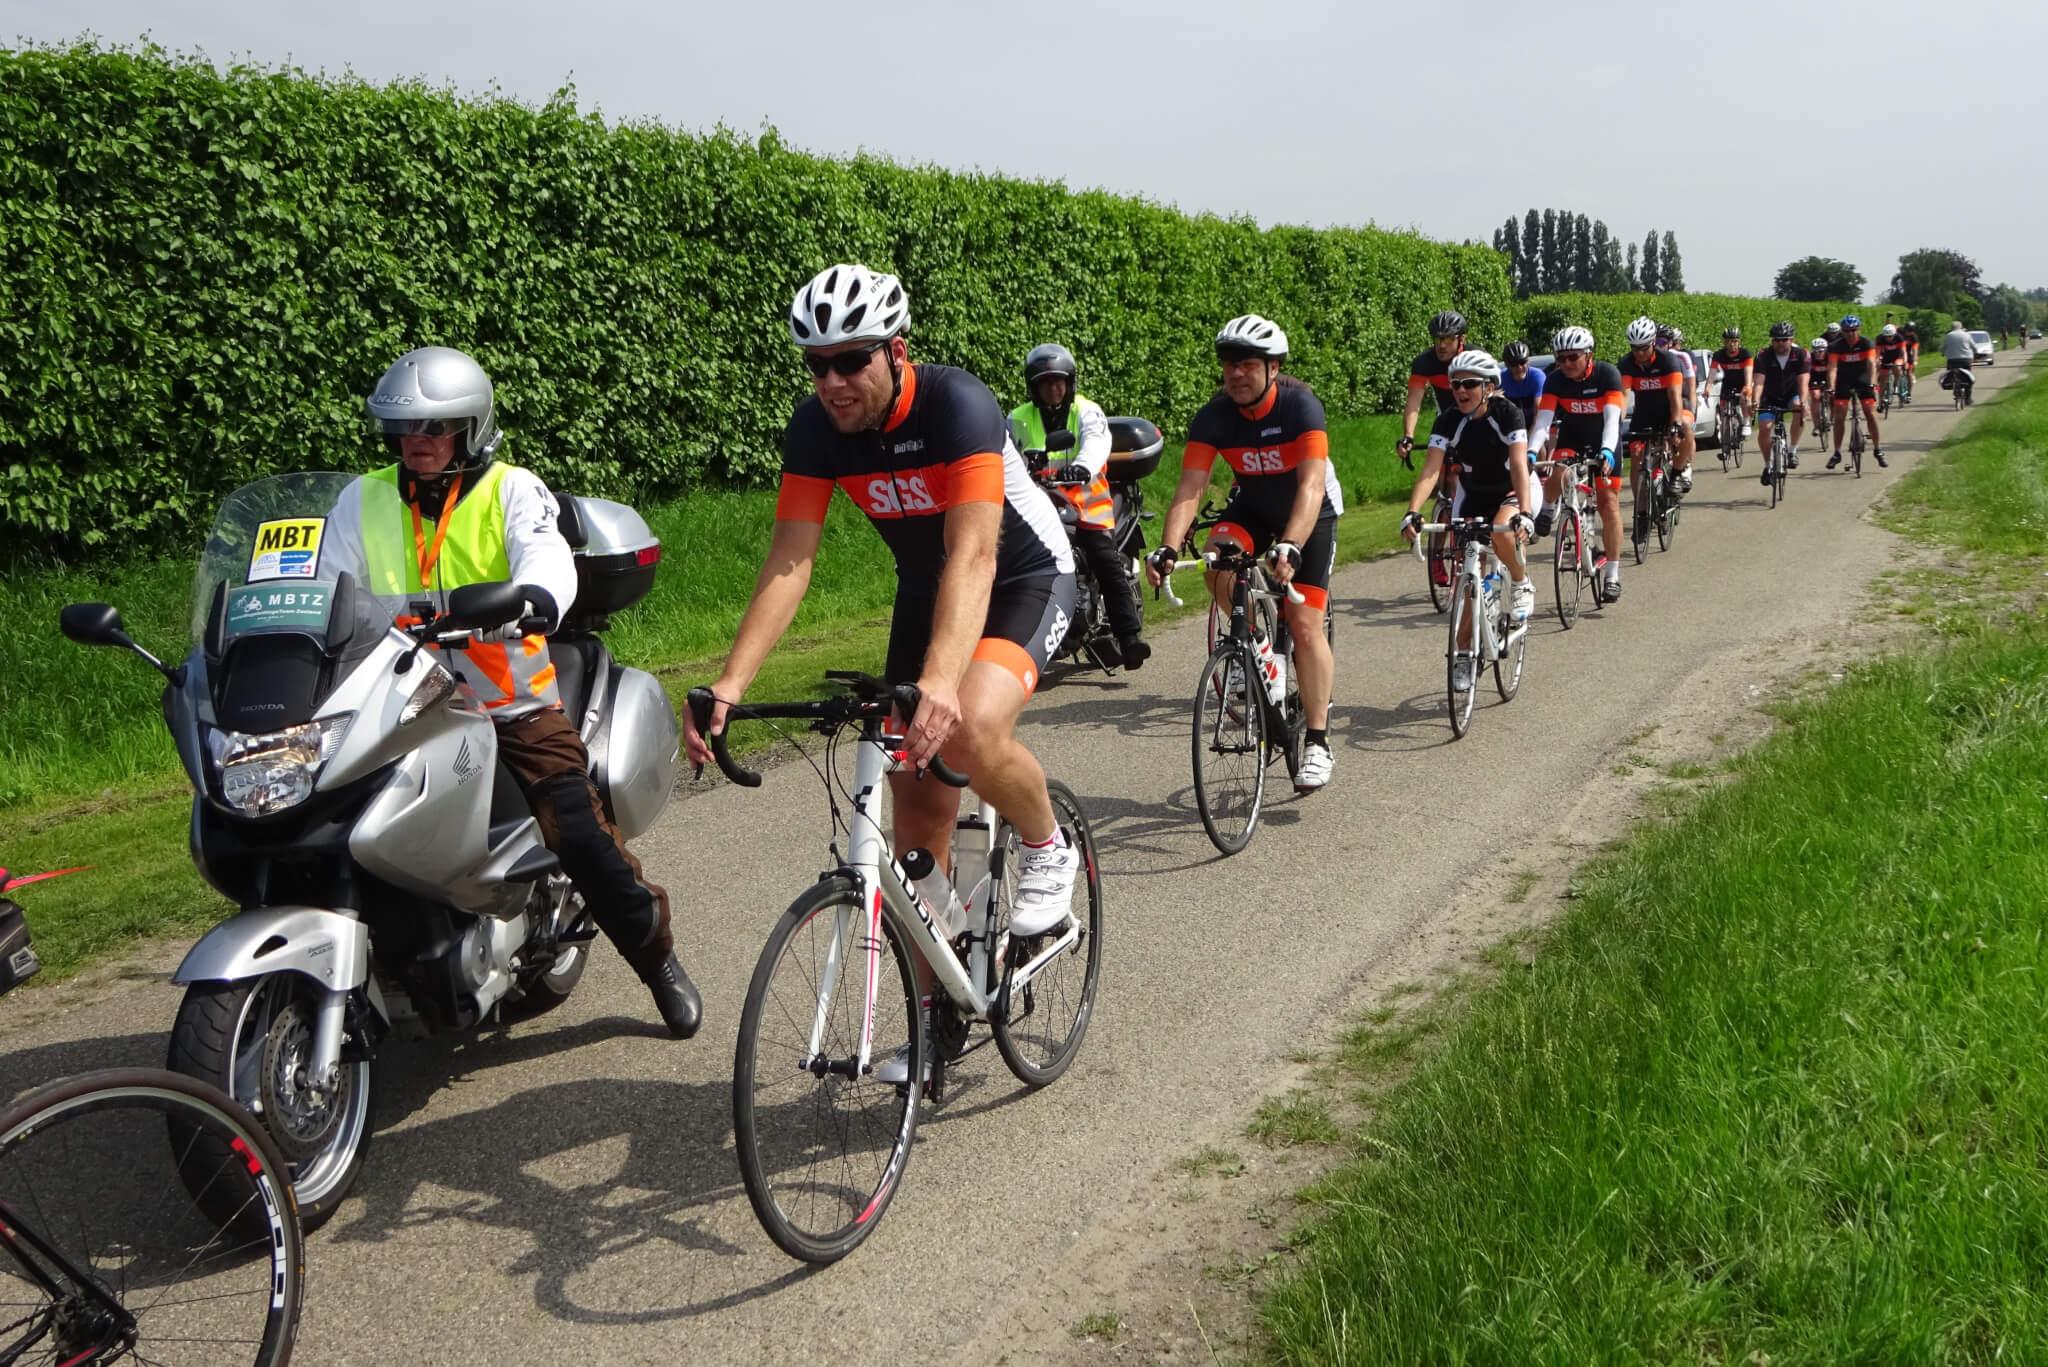 Fruitbedrijf Van den Berge_Ride for the Roses-10